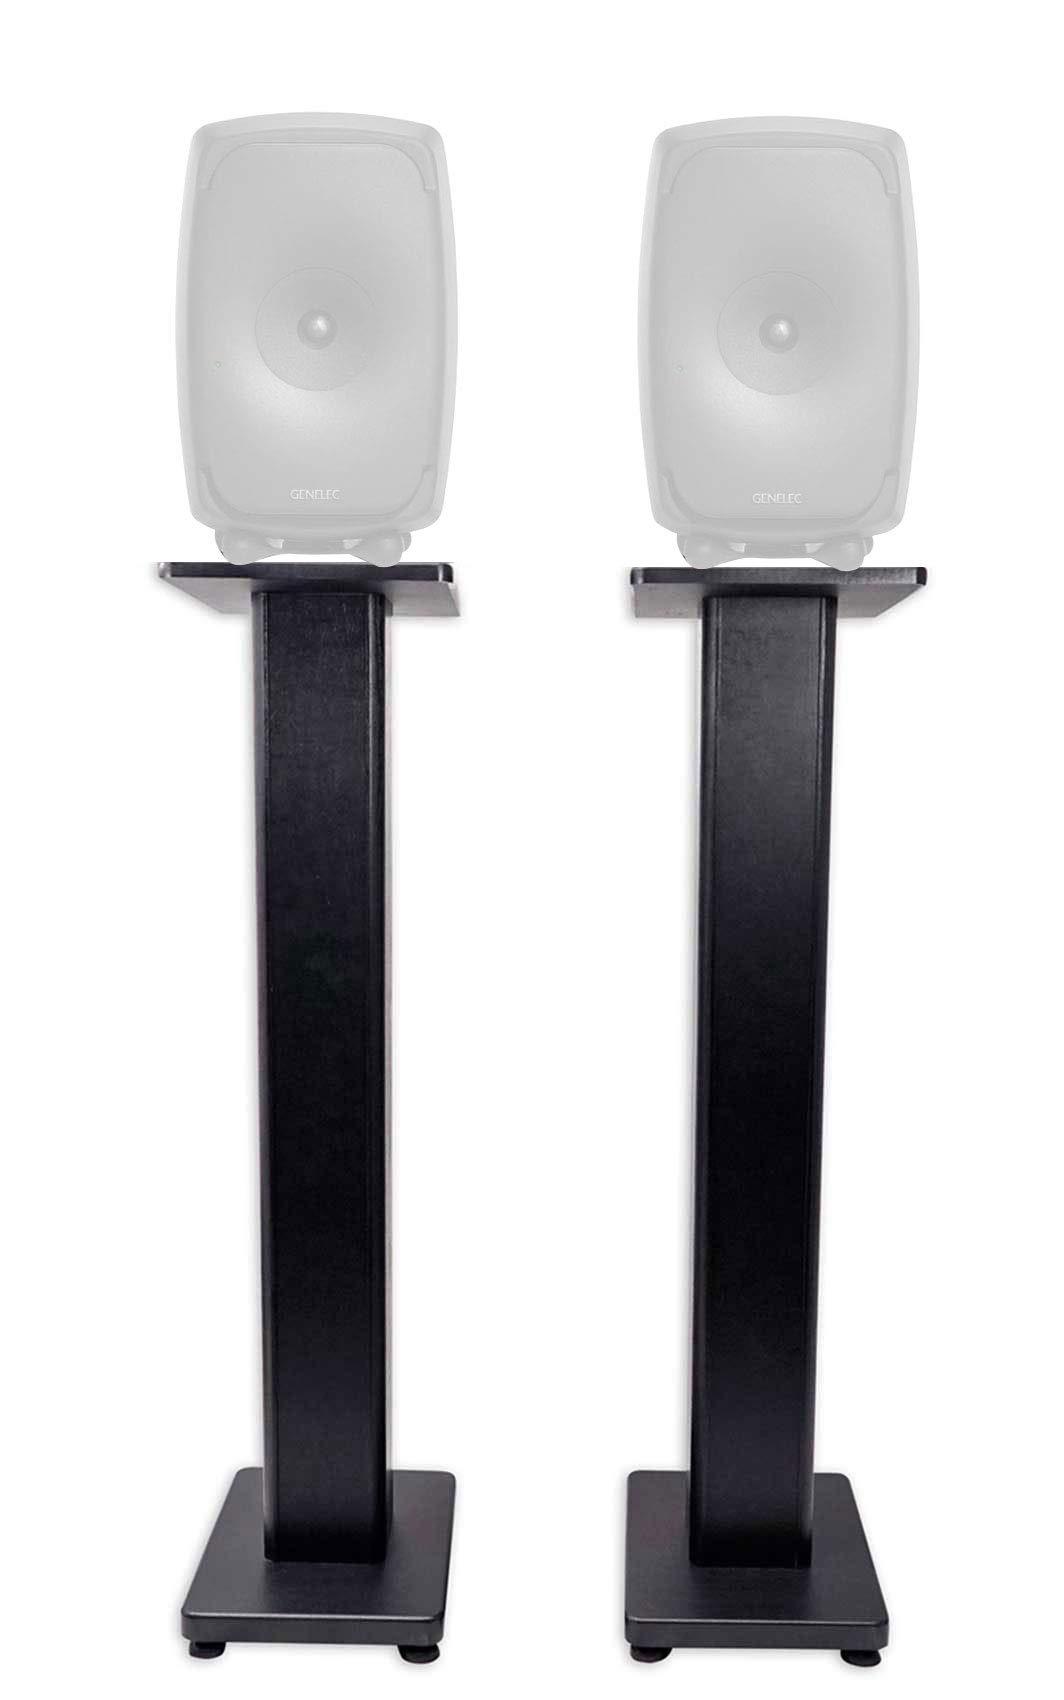 "Rockville 36"" Studio Monitor Speaker Stands for Genelec 8351A Monitors"